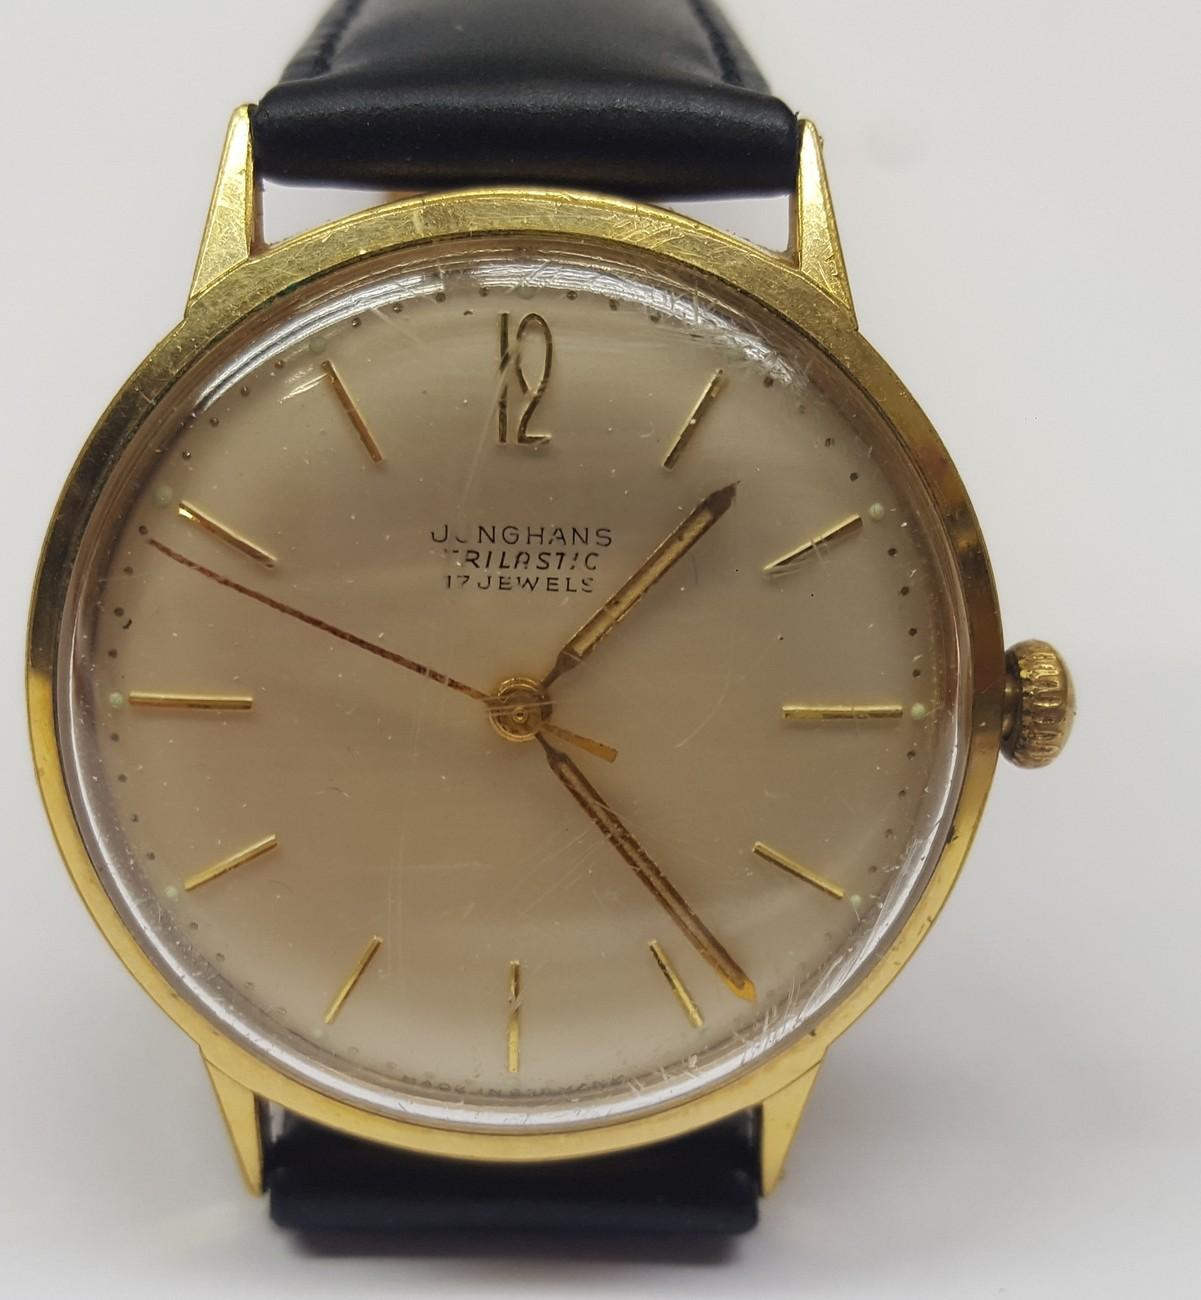 Uhr Junghans 17 Jewels